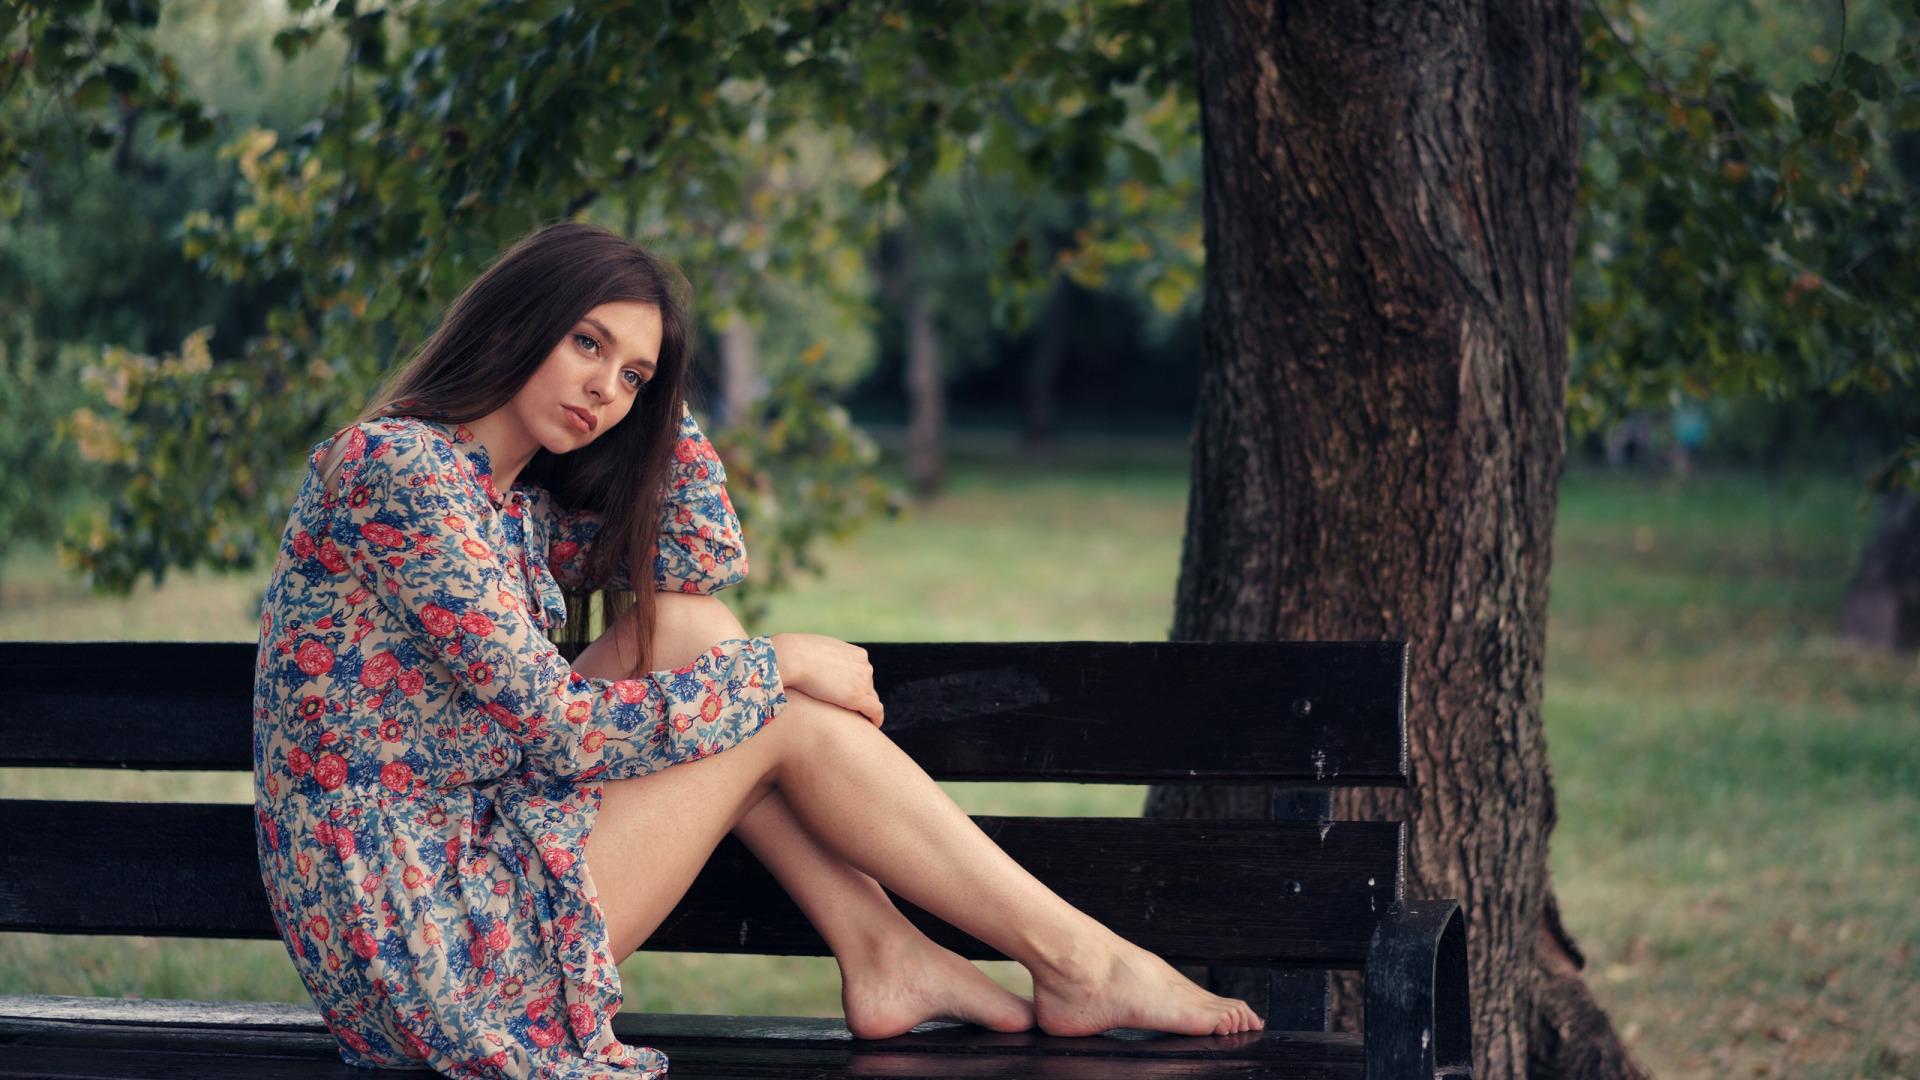 https://img5.goodfon.ru/original/1920x1080/5/a3/devushka-plate-nozhki-sidit-skameika-park-sergei-churnosov.jpg